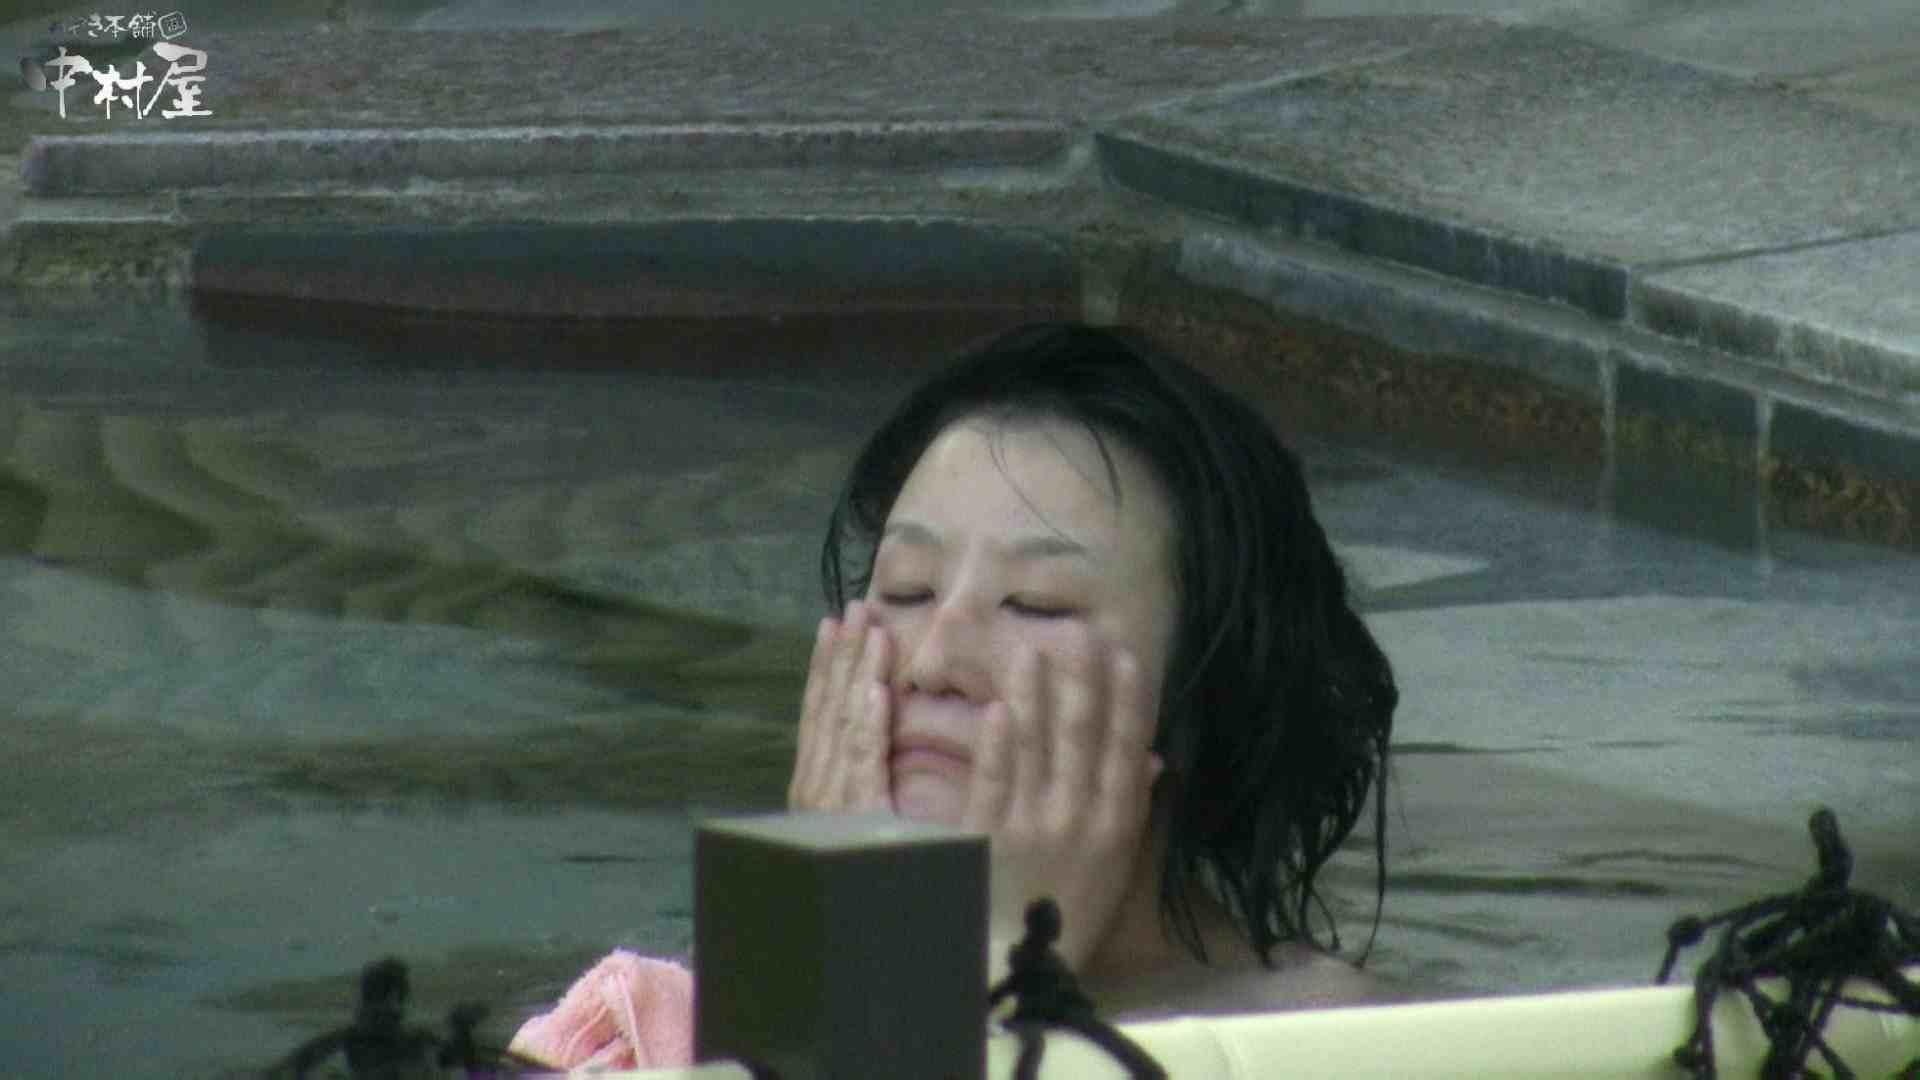 Aquaな露天風呂Vol.982 露天風呂突入 SEX無修正画像 78pic 35